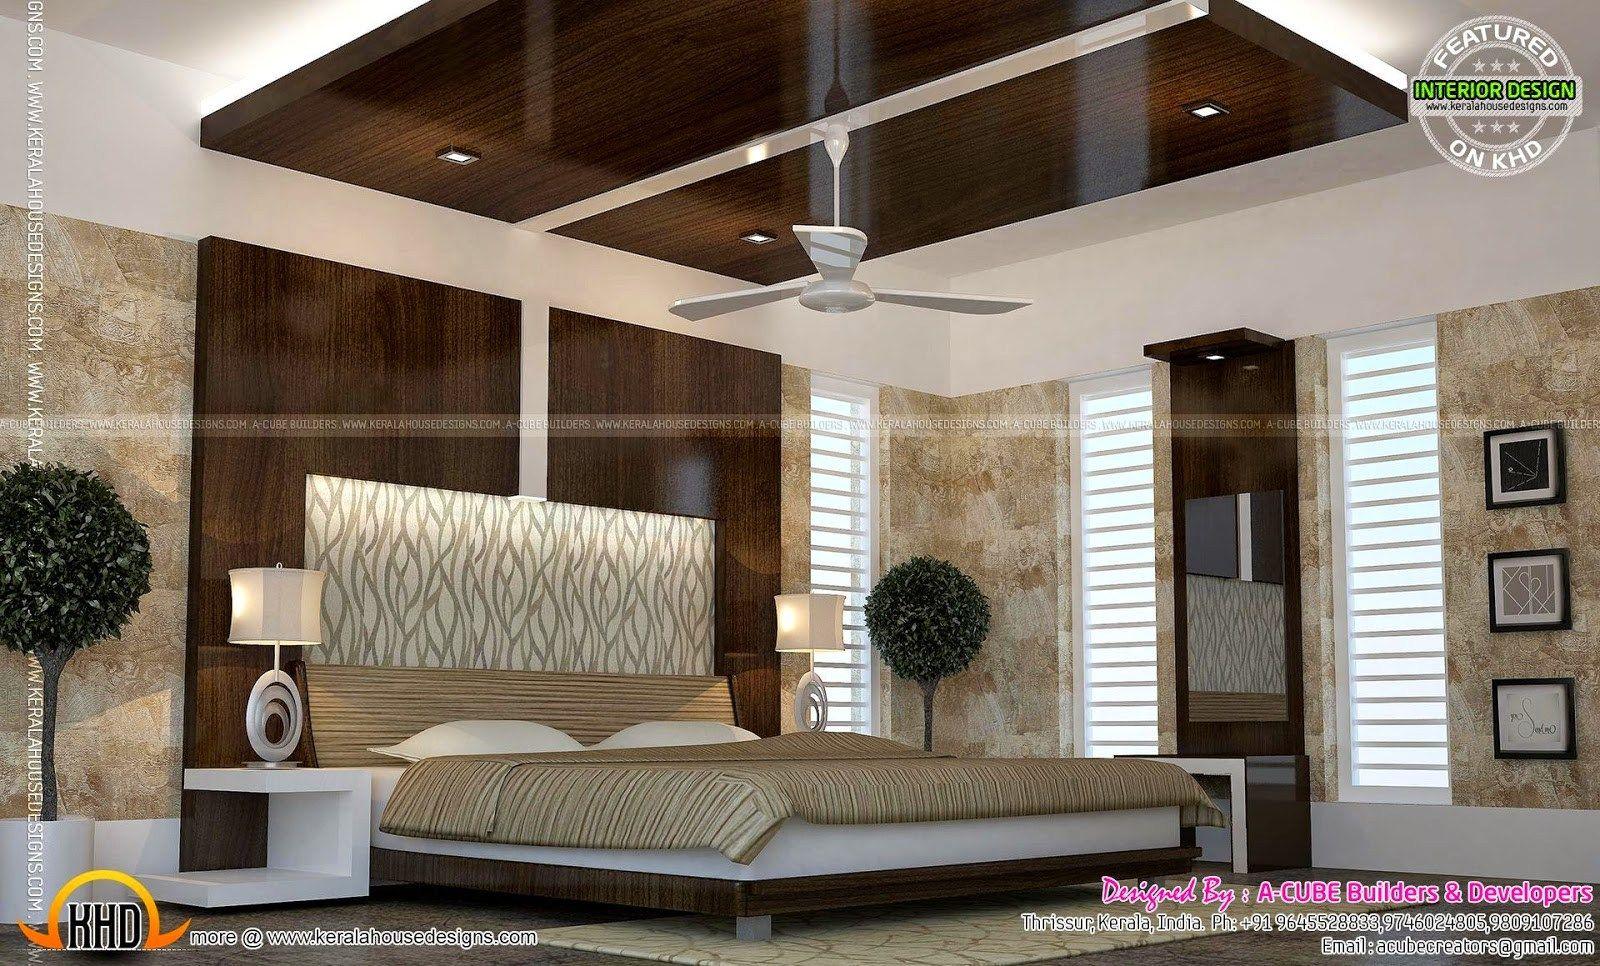 Kerala interior design ideas kerala home design floor plans container home floor plans kerala home design plans